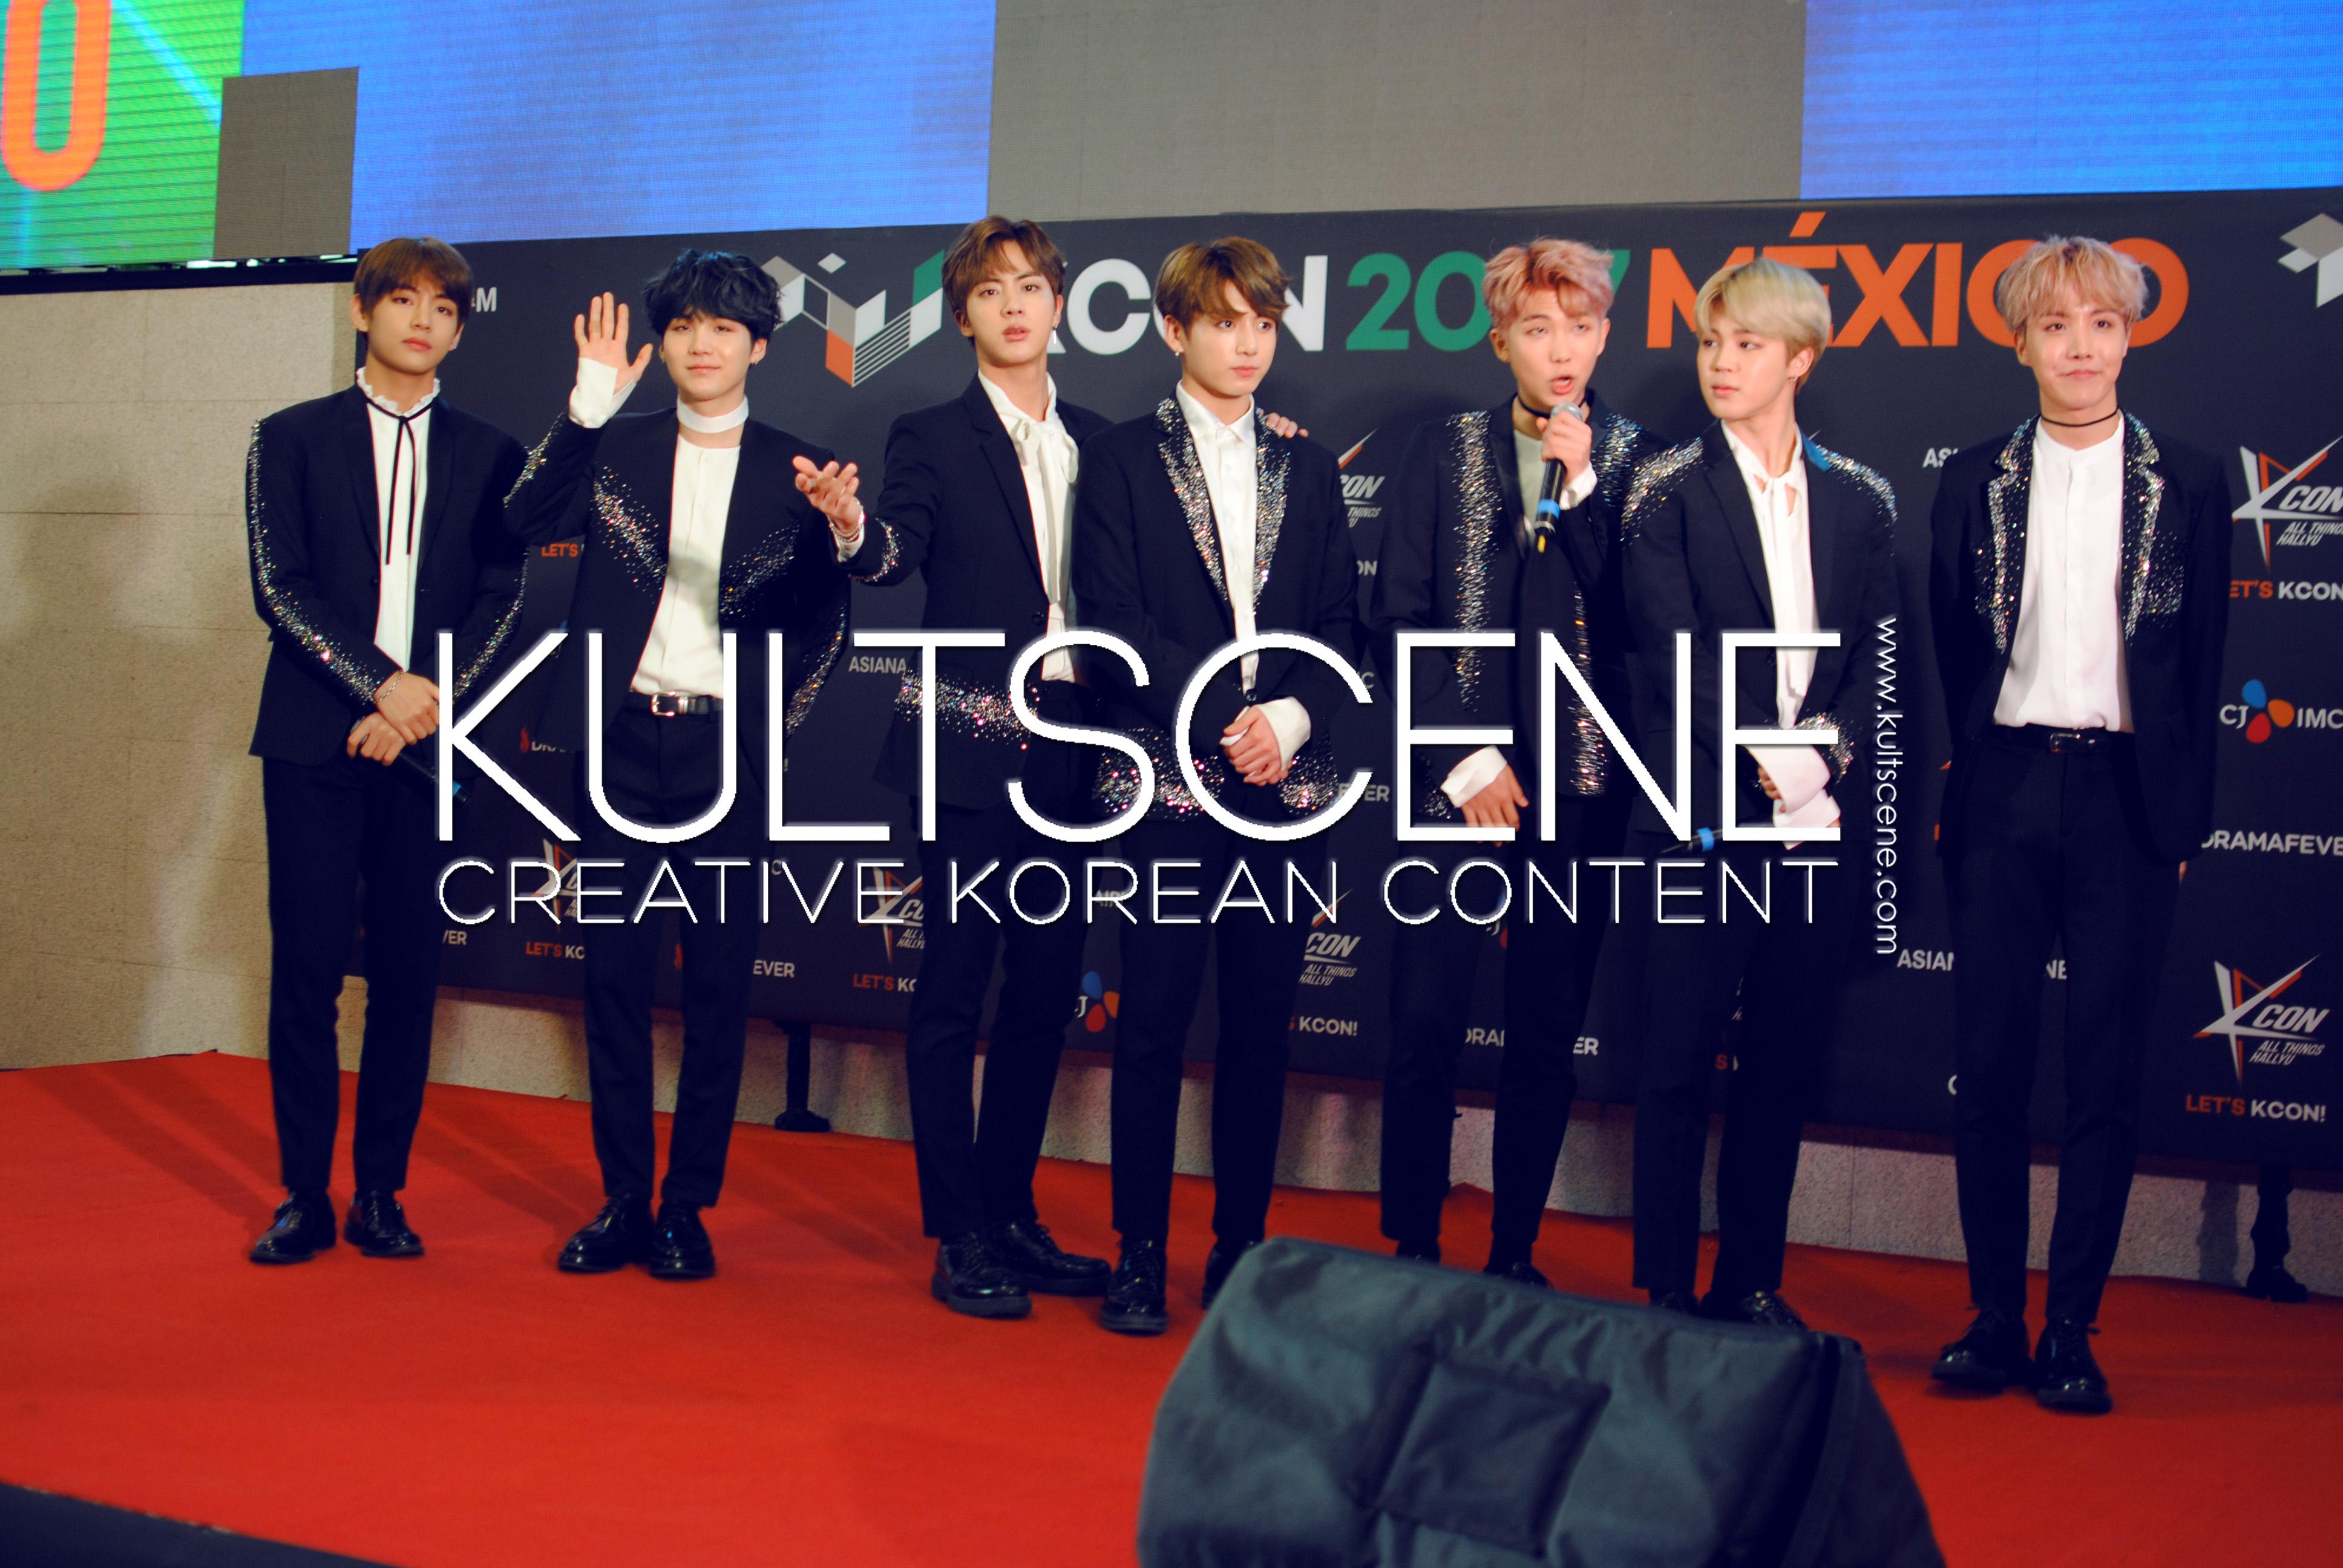 kcon mexico 2017 bts v suga yoongi taehyun jin seokjin jungkook rap monster namjoon jimin jhope j hope red carpet kpop 17 mx